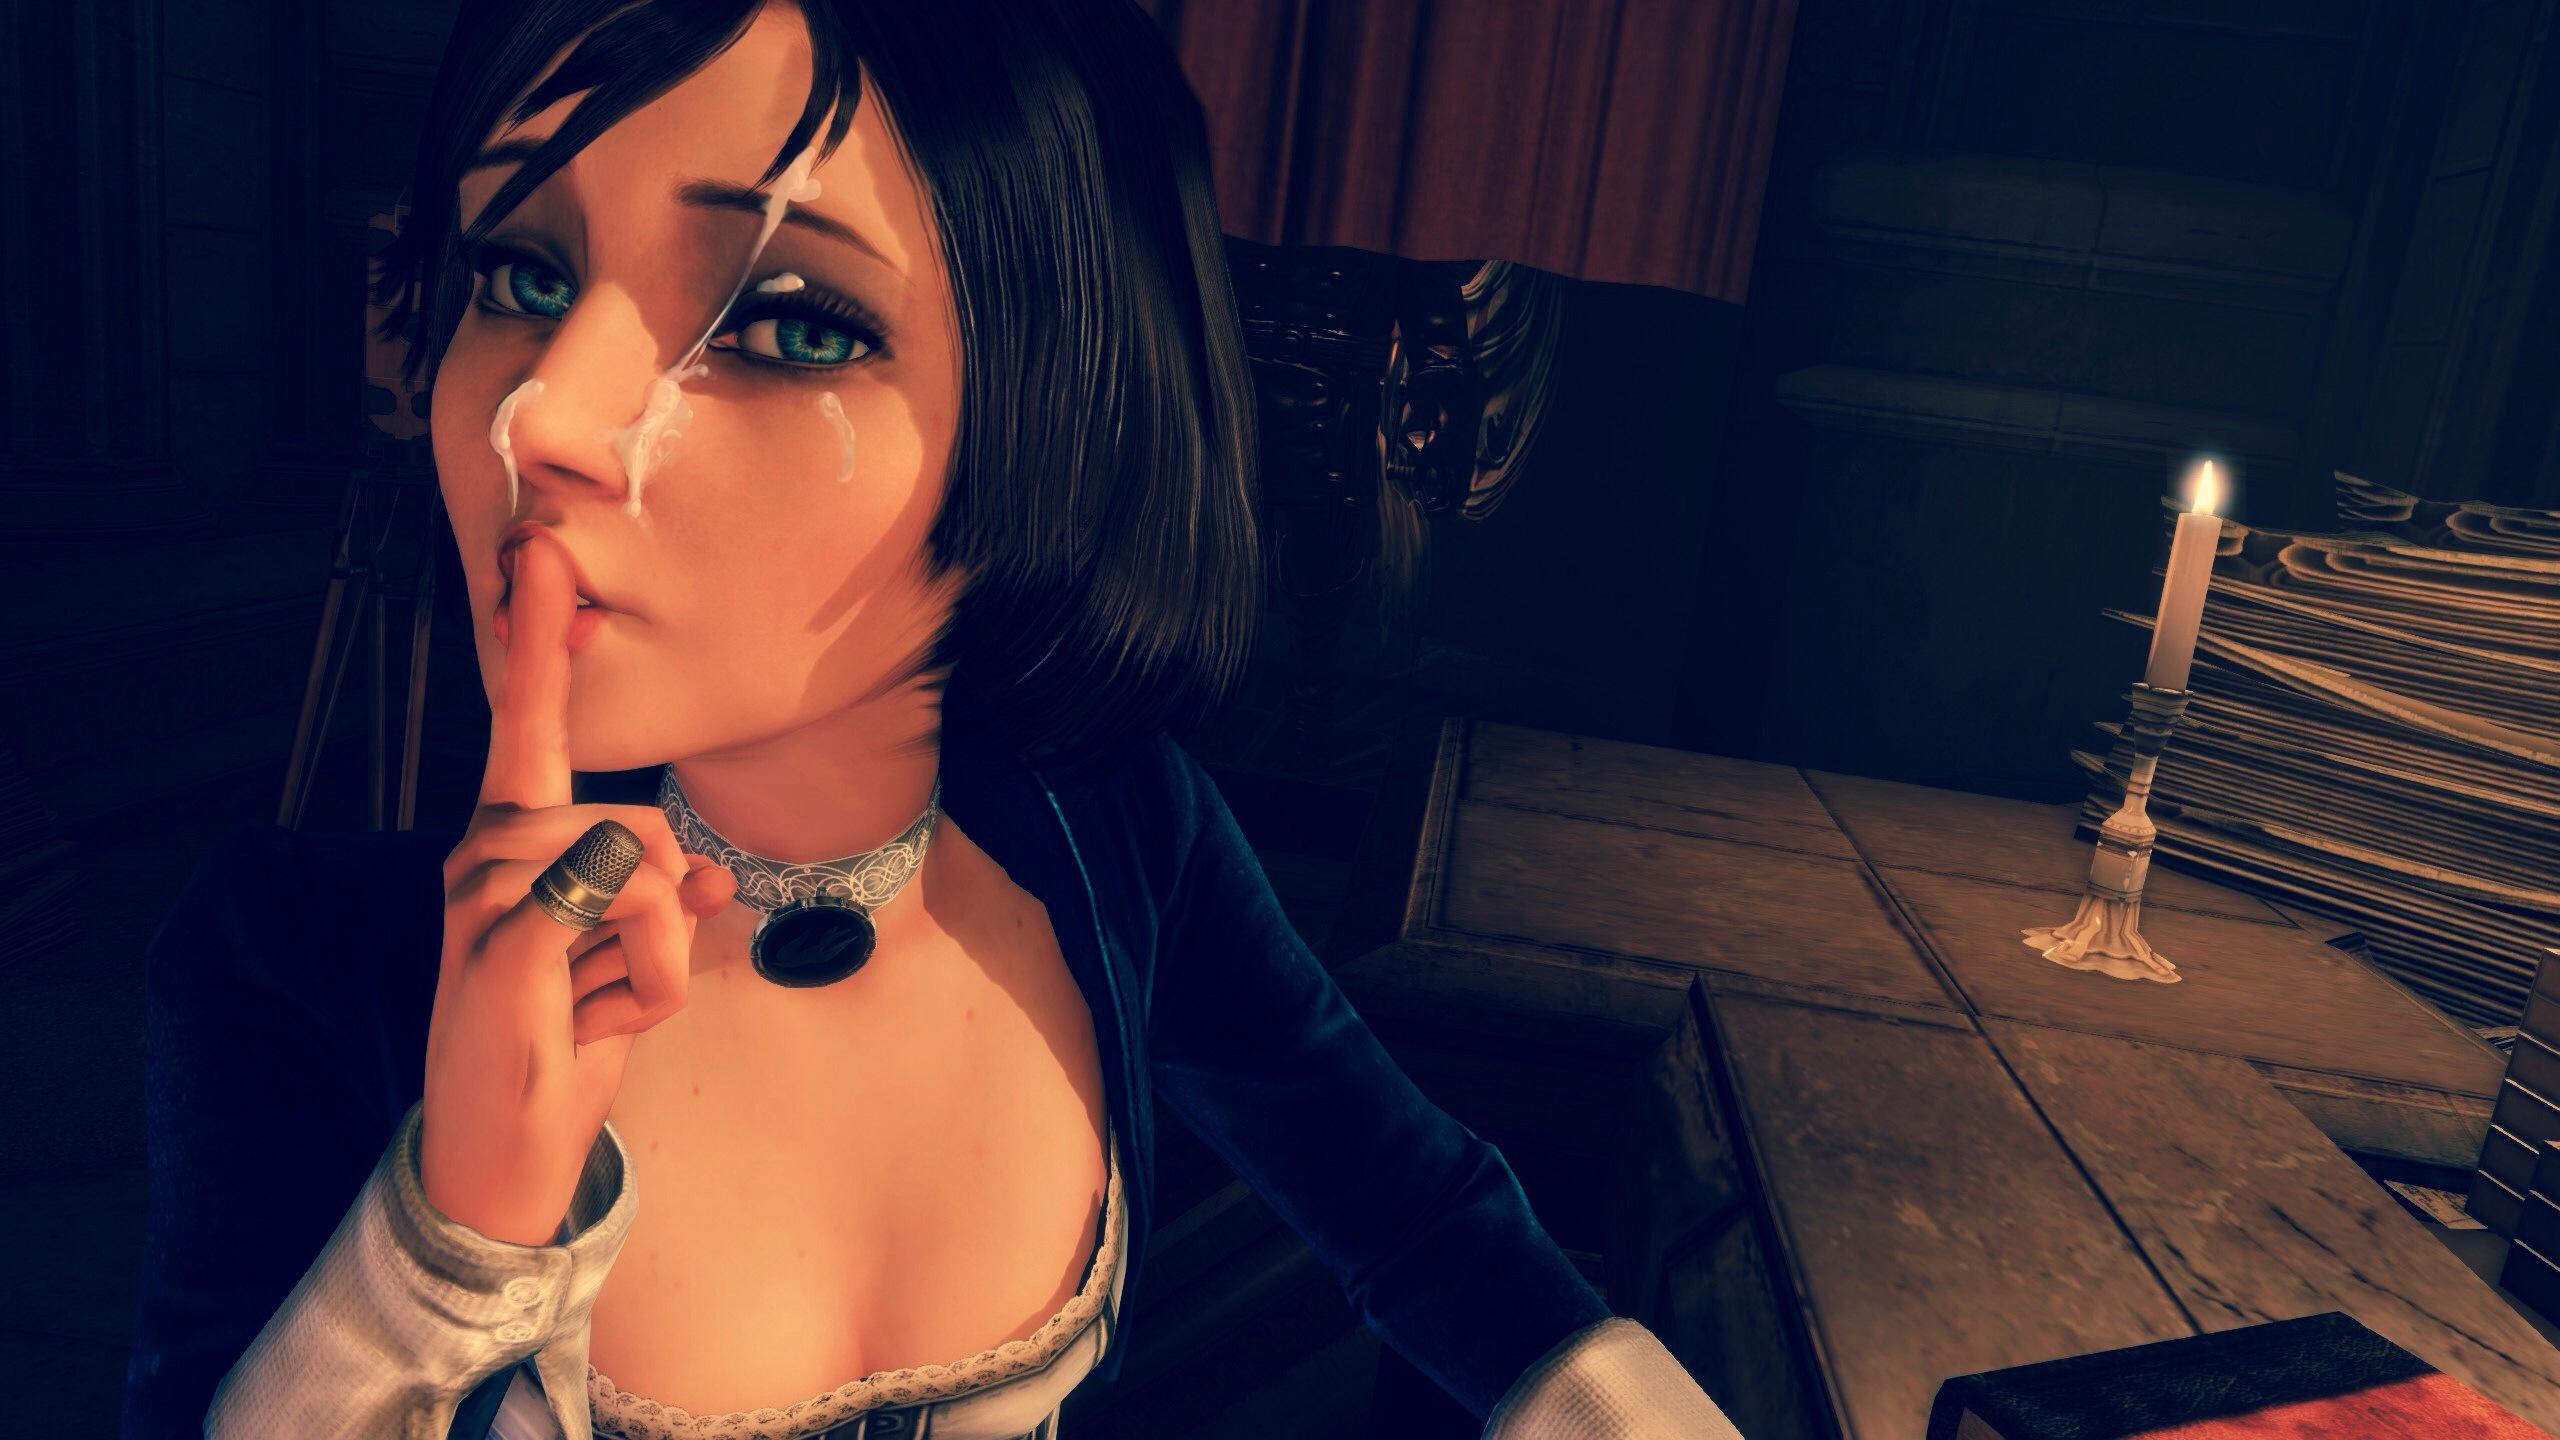 Elisabeth shue sexy dress